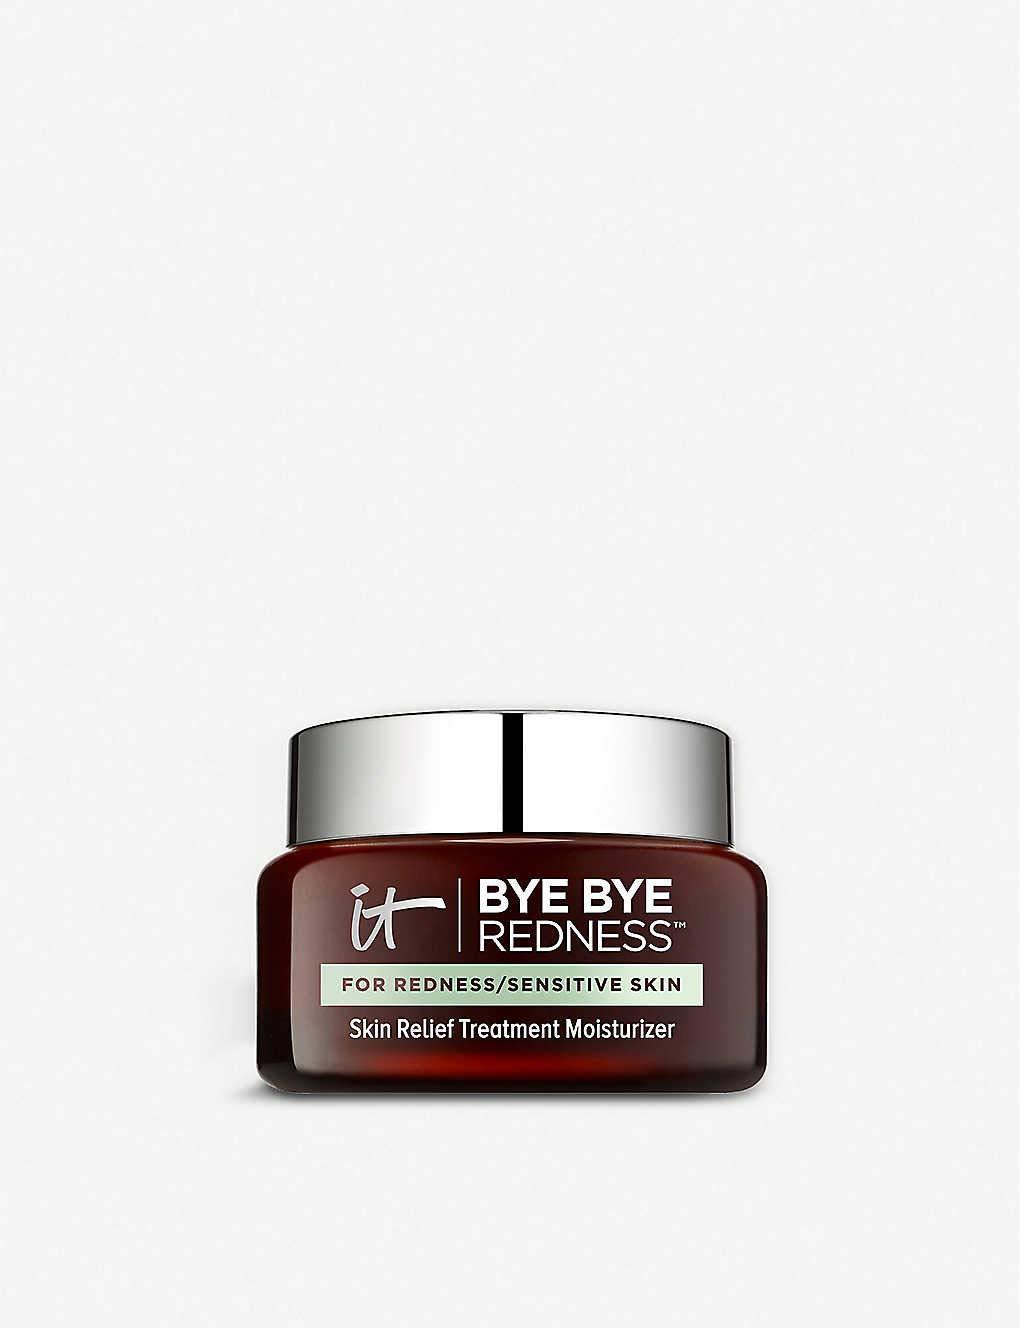 lT Cosmetics Bye Bye Redness Skin Relief Treatment Moisturizer Full size 2oz 60ml